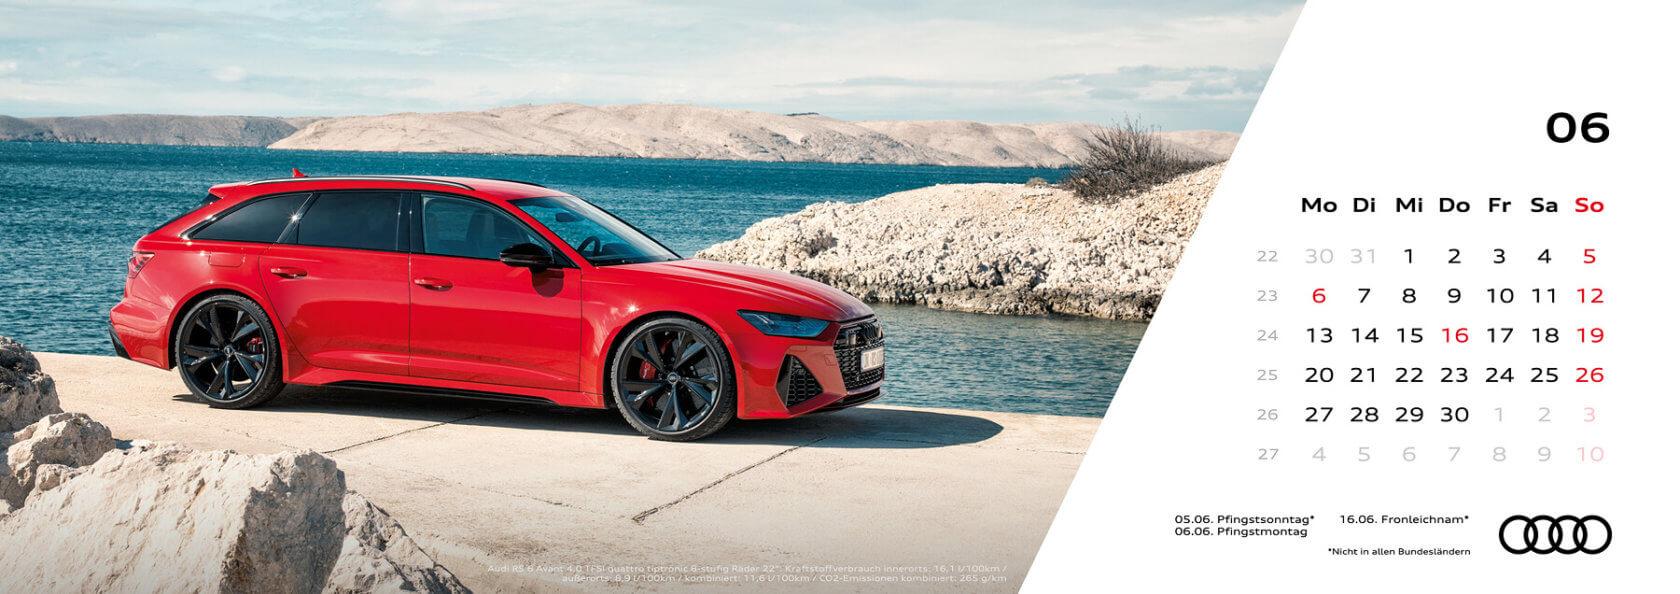 Audi Tischkalender 2022 - Juni